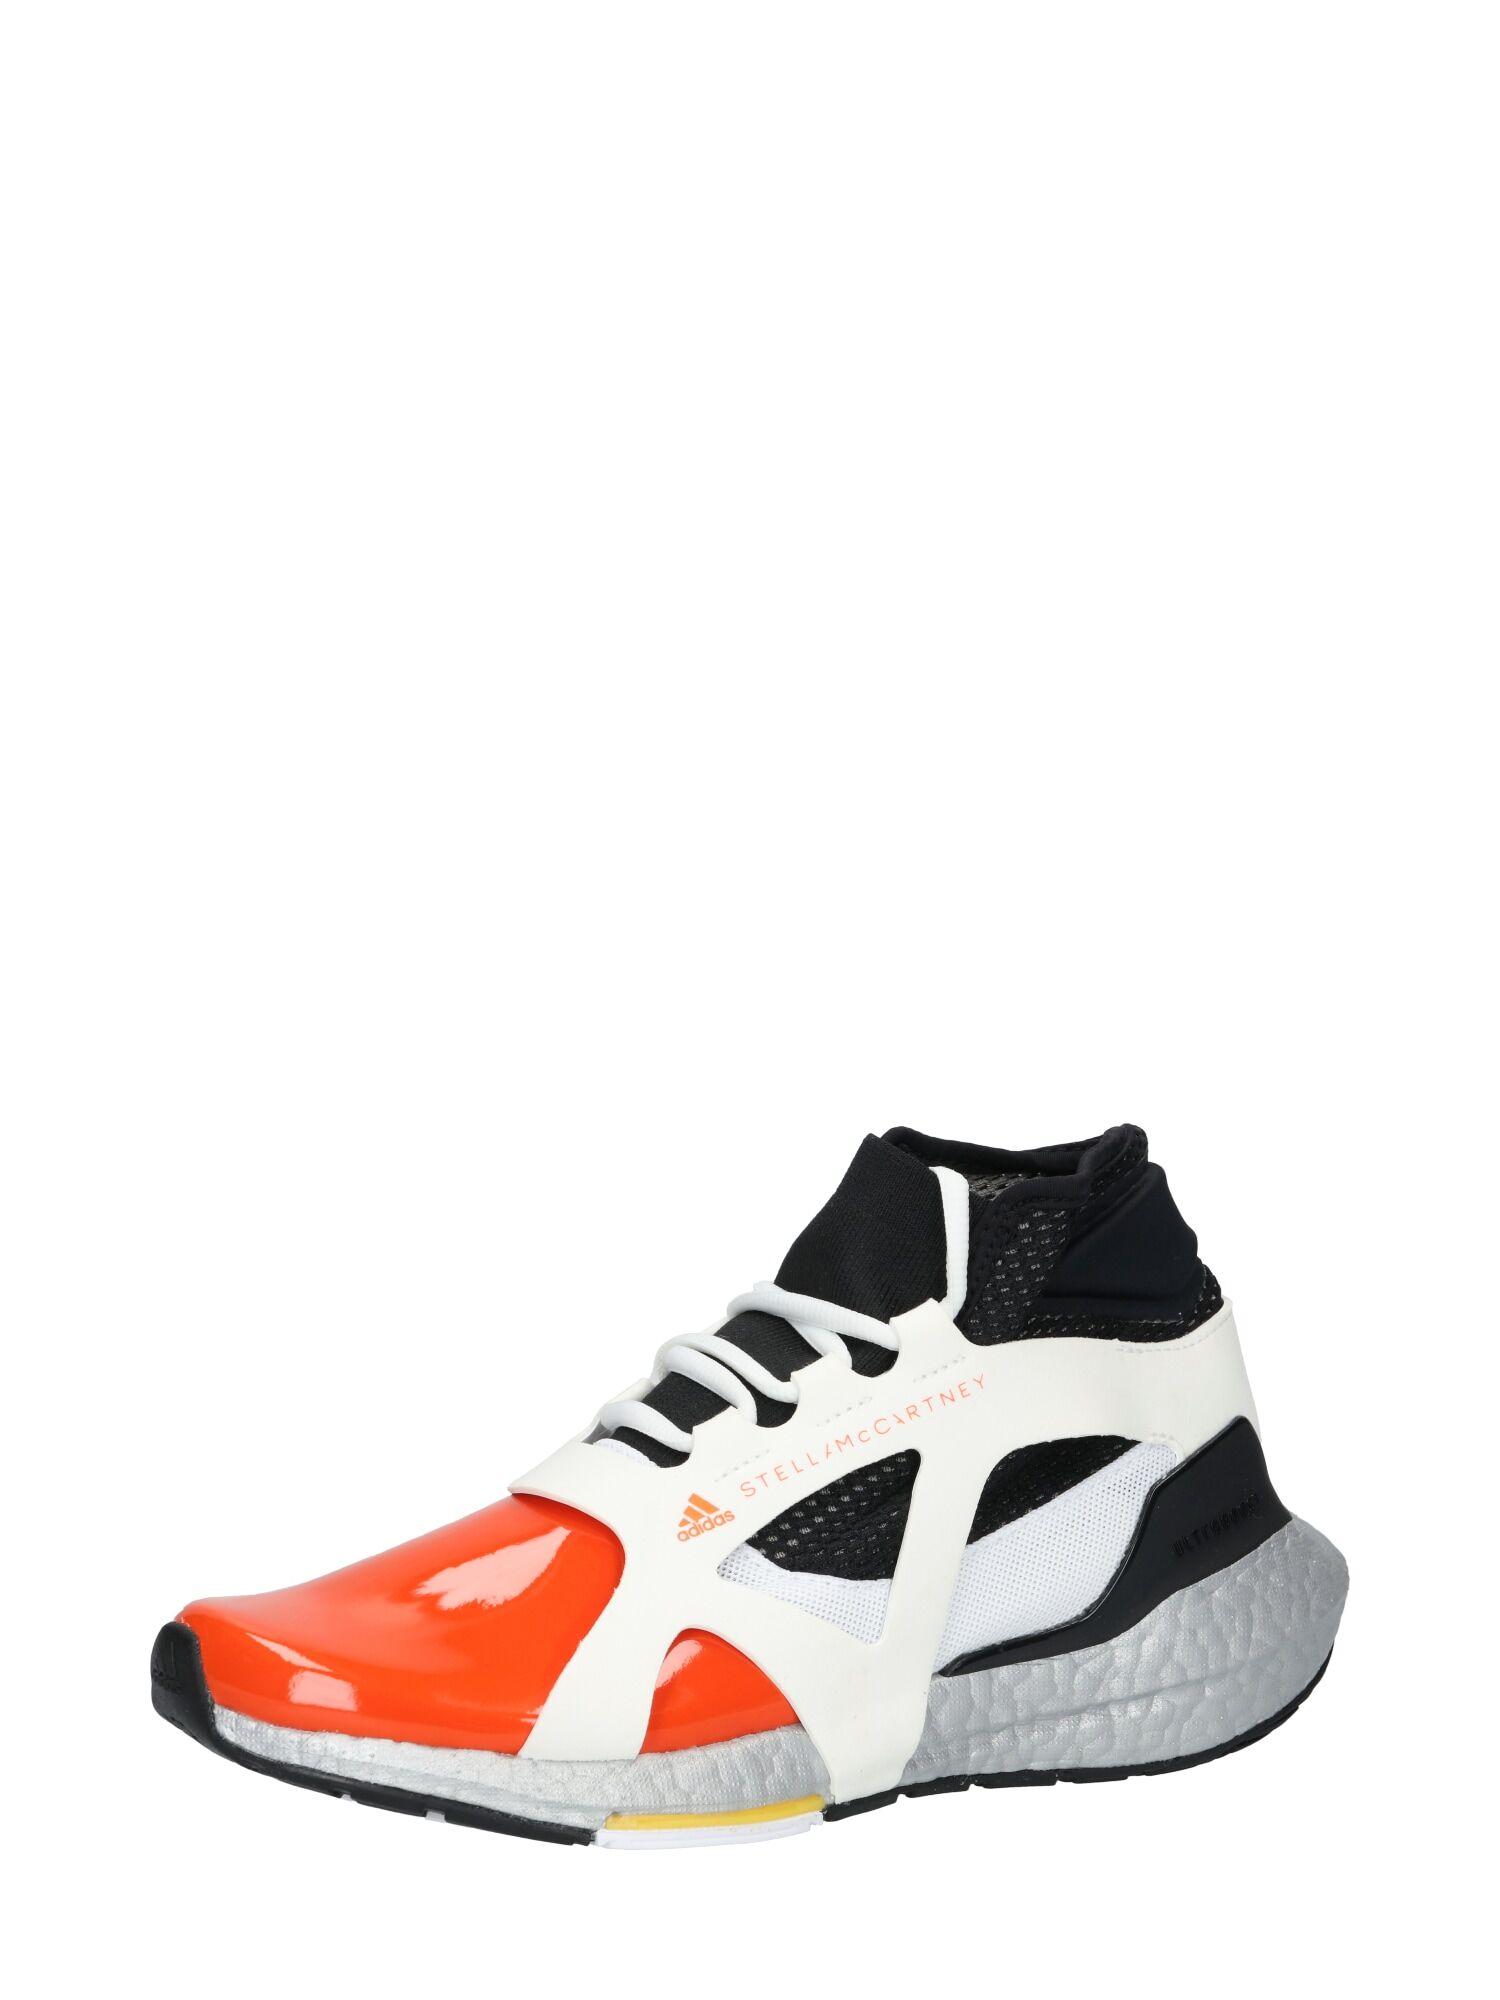 adidas by stella mccartney scarpa sportiva bianco